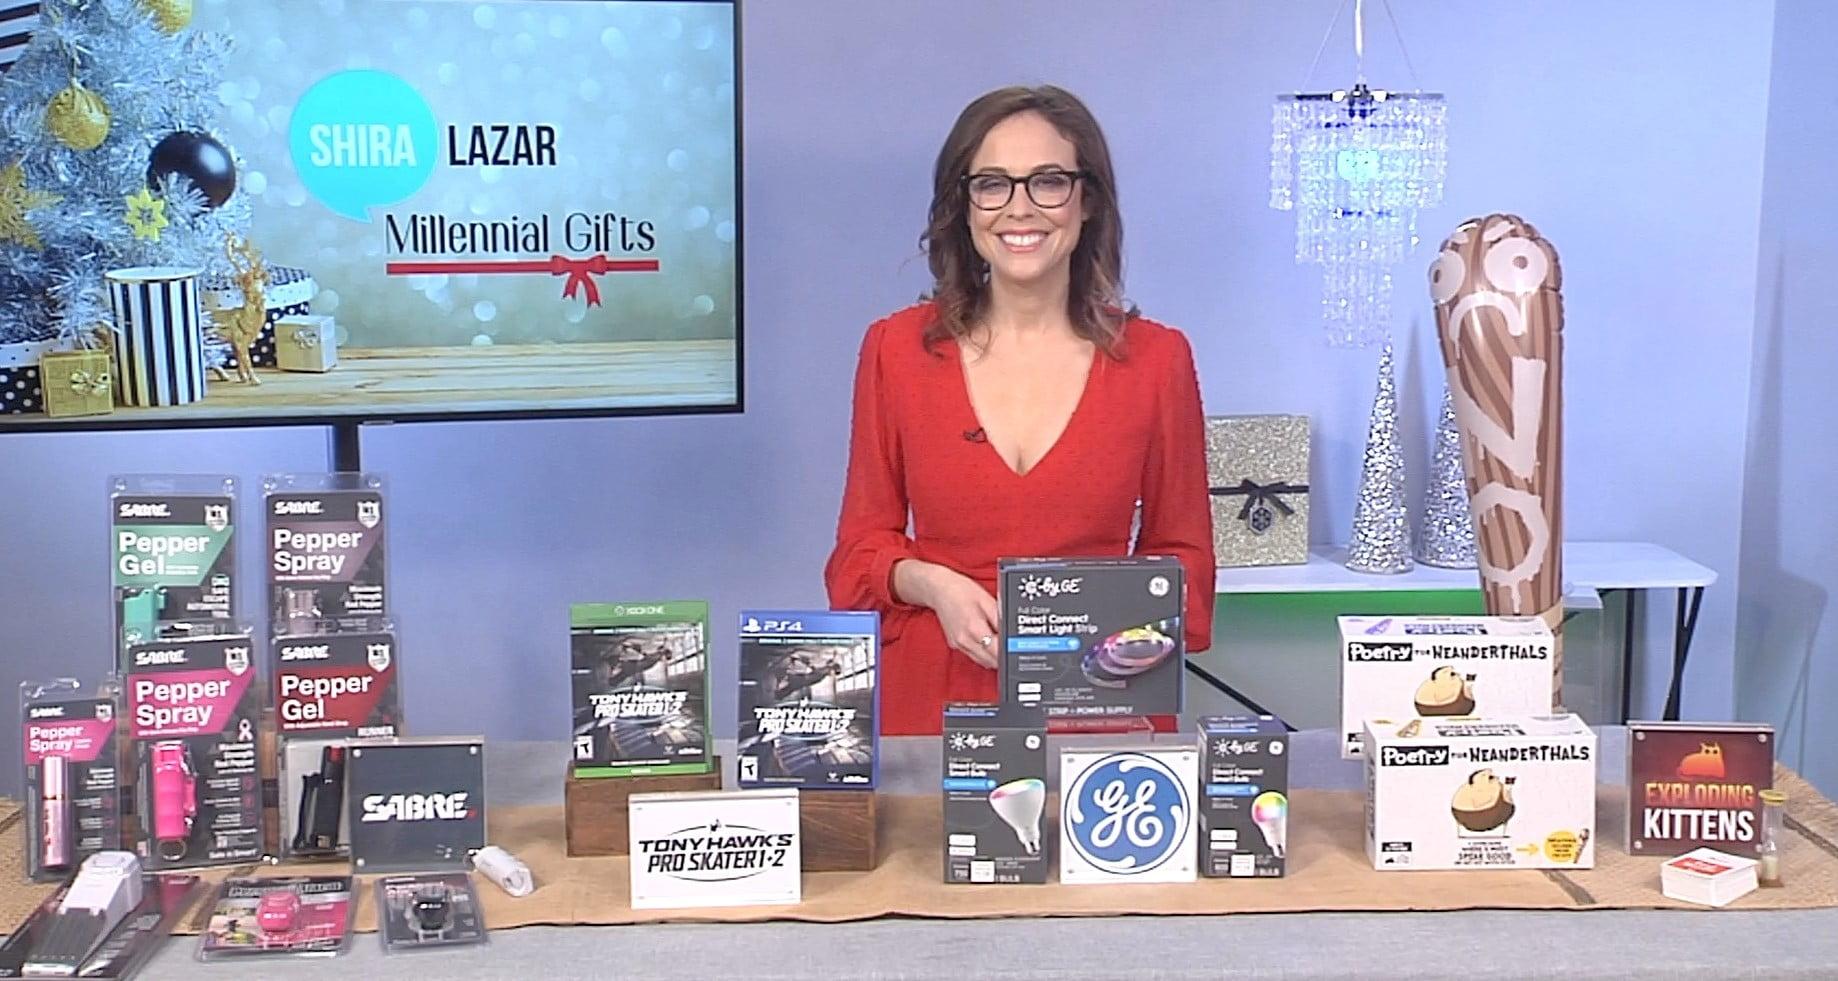 Social Media Expert Shira Lazar Shares Millennial Gift Ideas with TipsOnTV